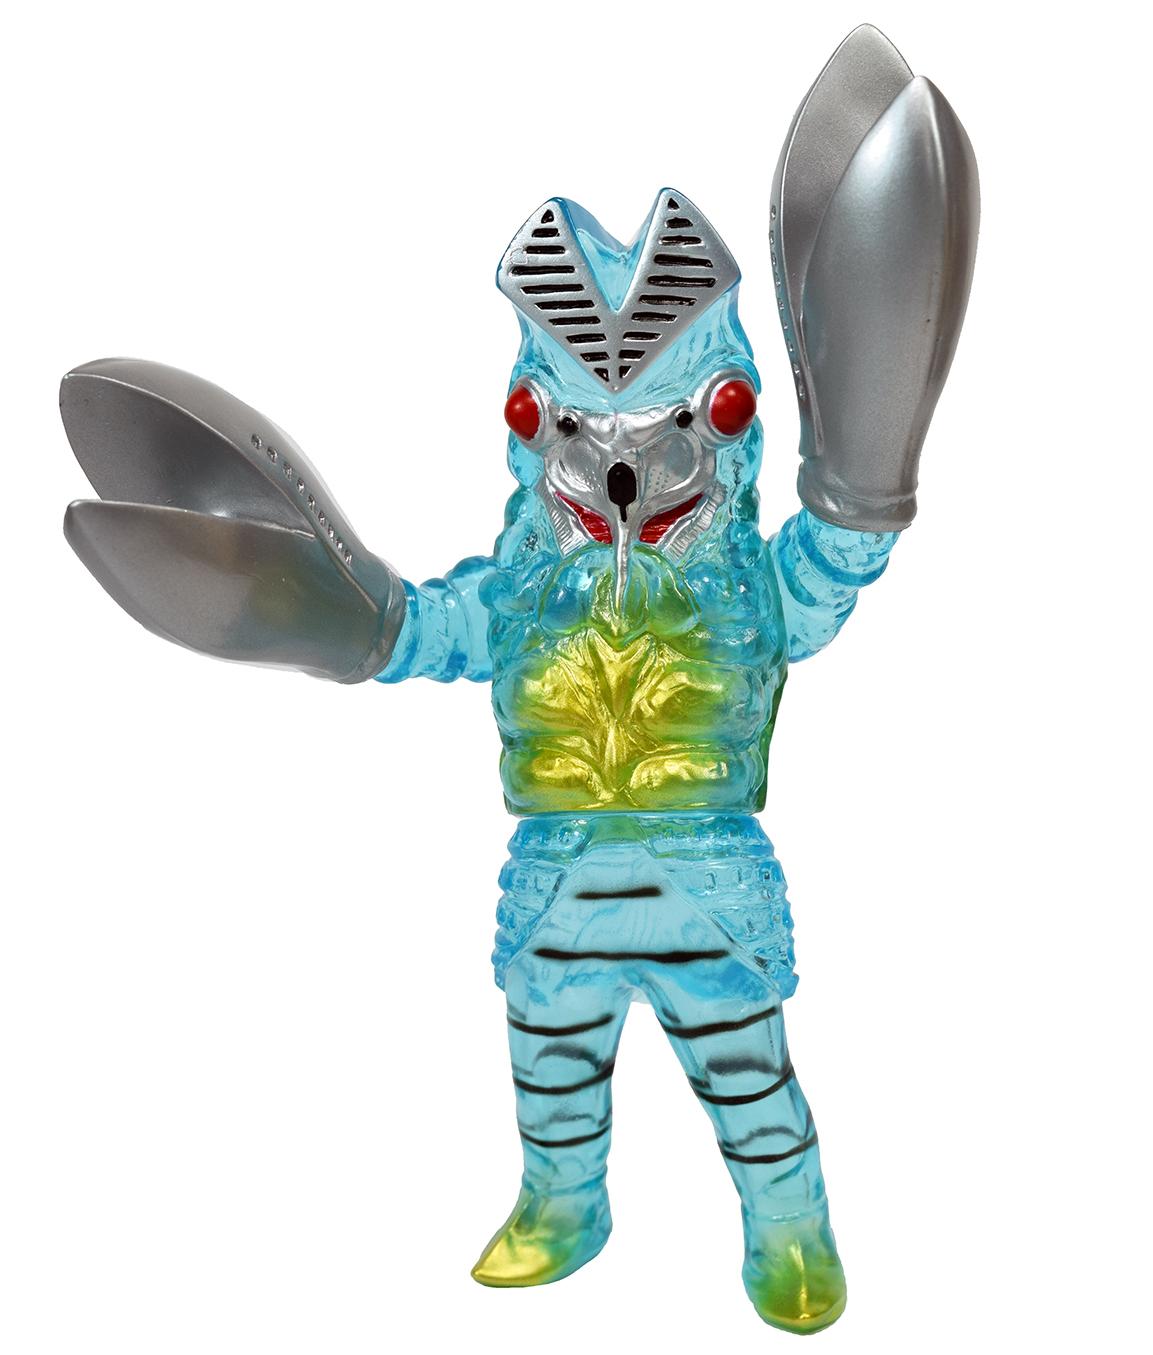 Alien Baltan Ultraman Kaiju Soko series Max Toy x Tsuburaya Pro